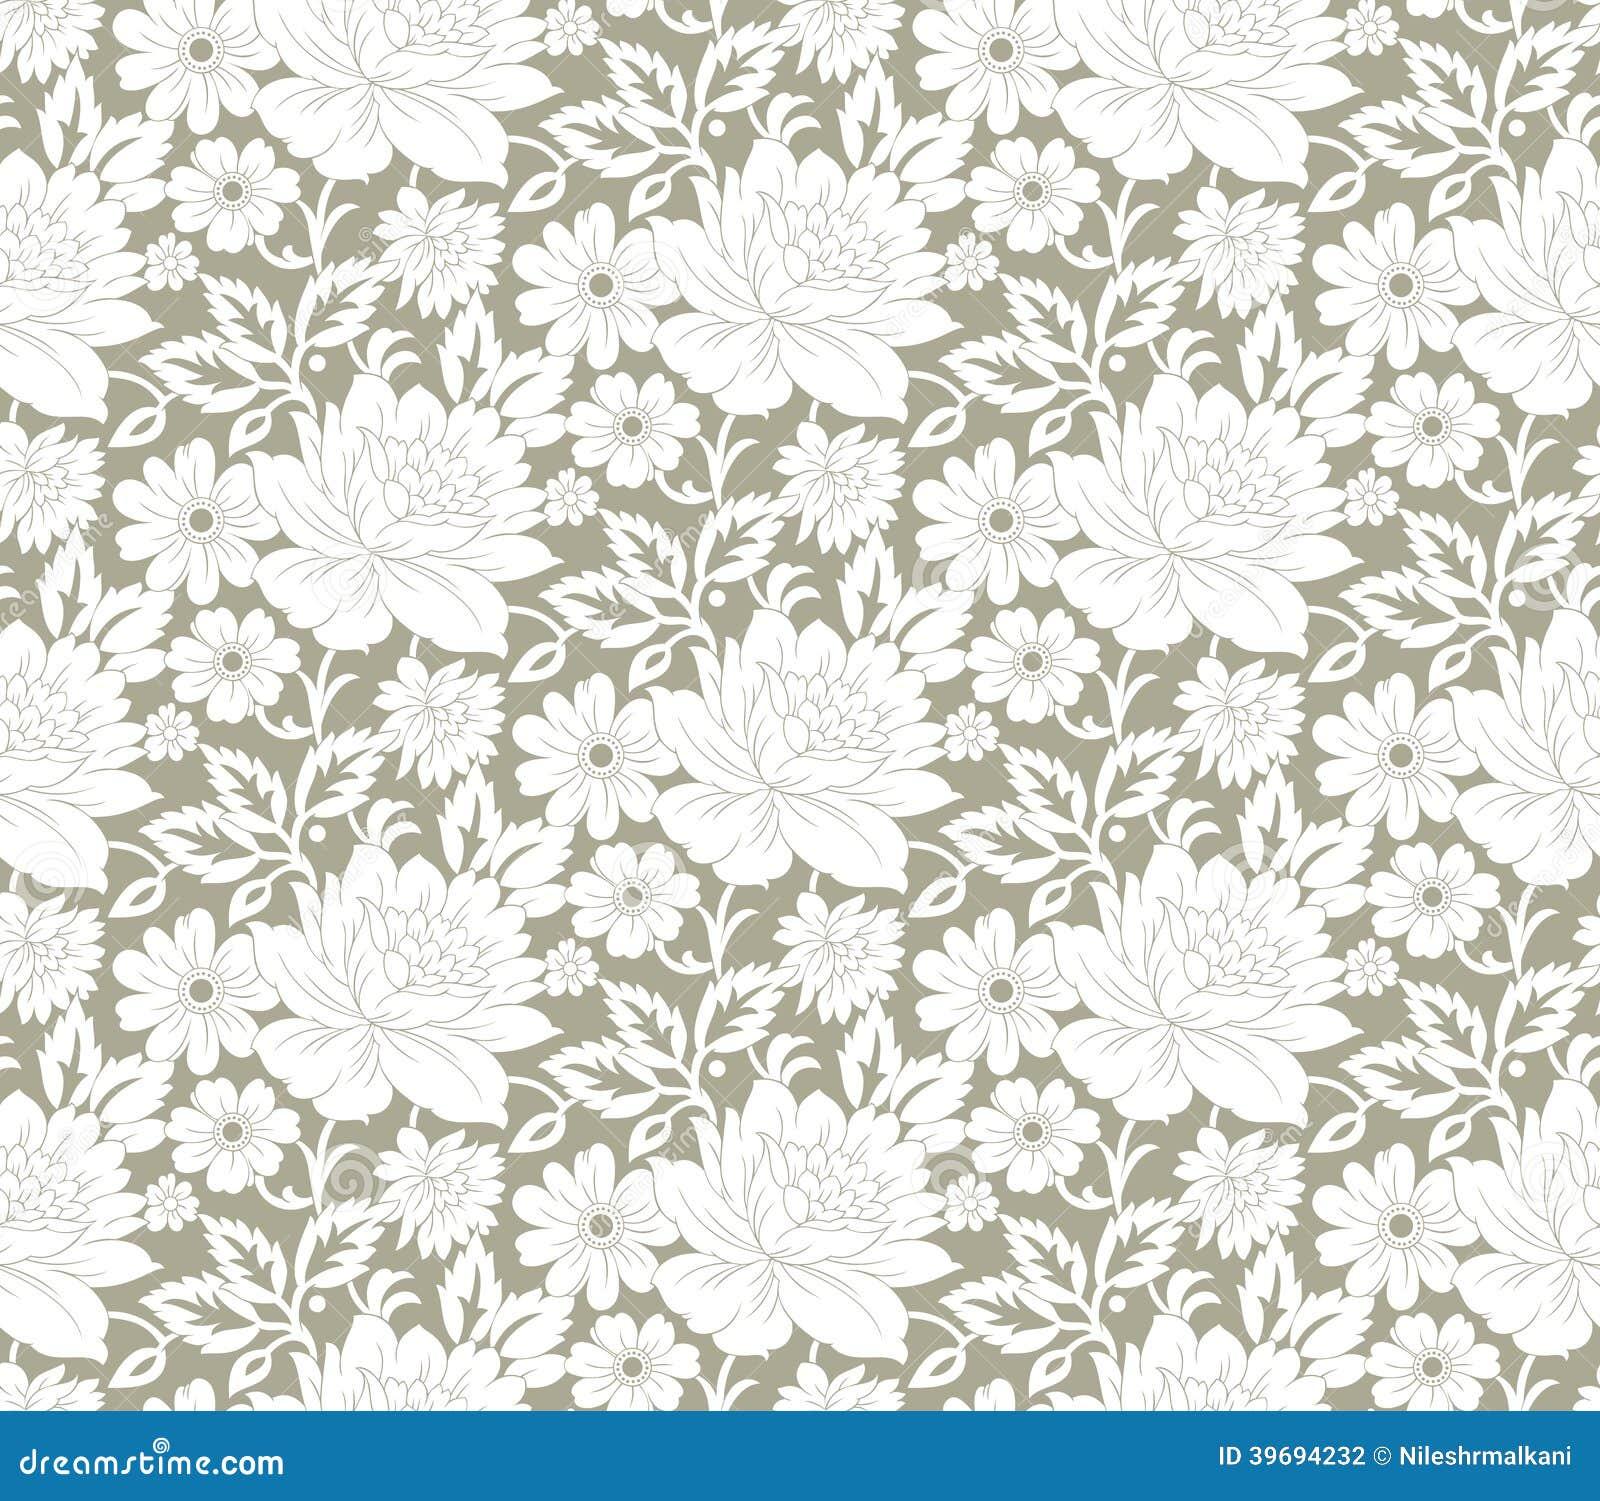 Fancy Wallpaper Floral Seamless Fancy Wallpaper Stock Vector Image 39694232